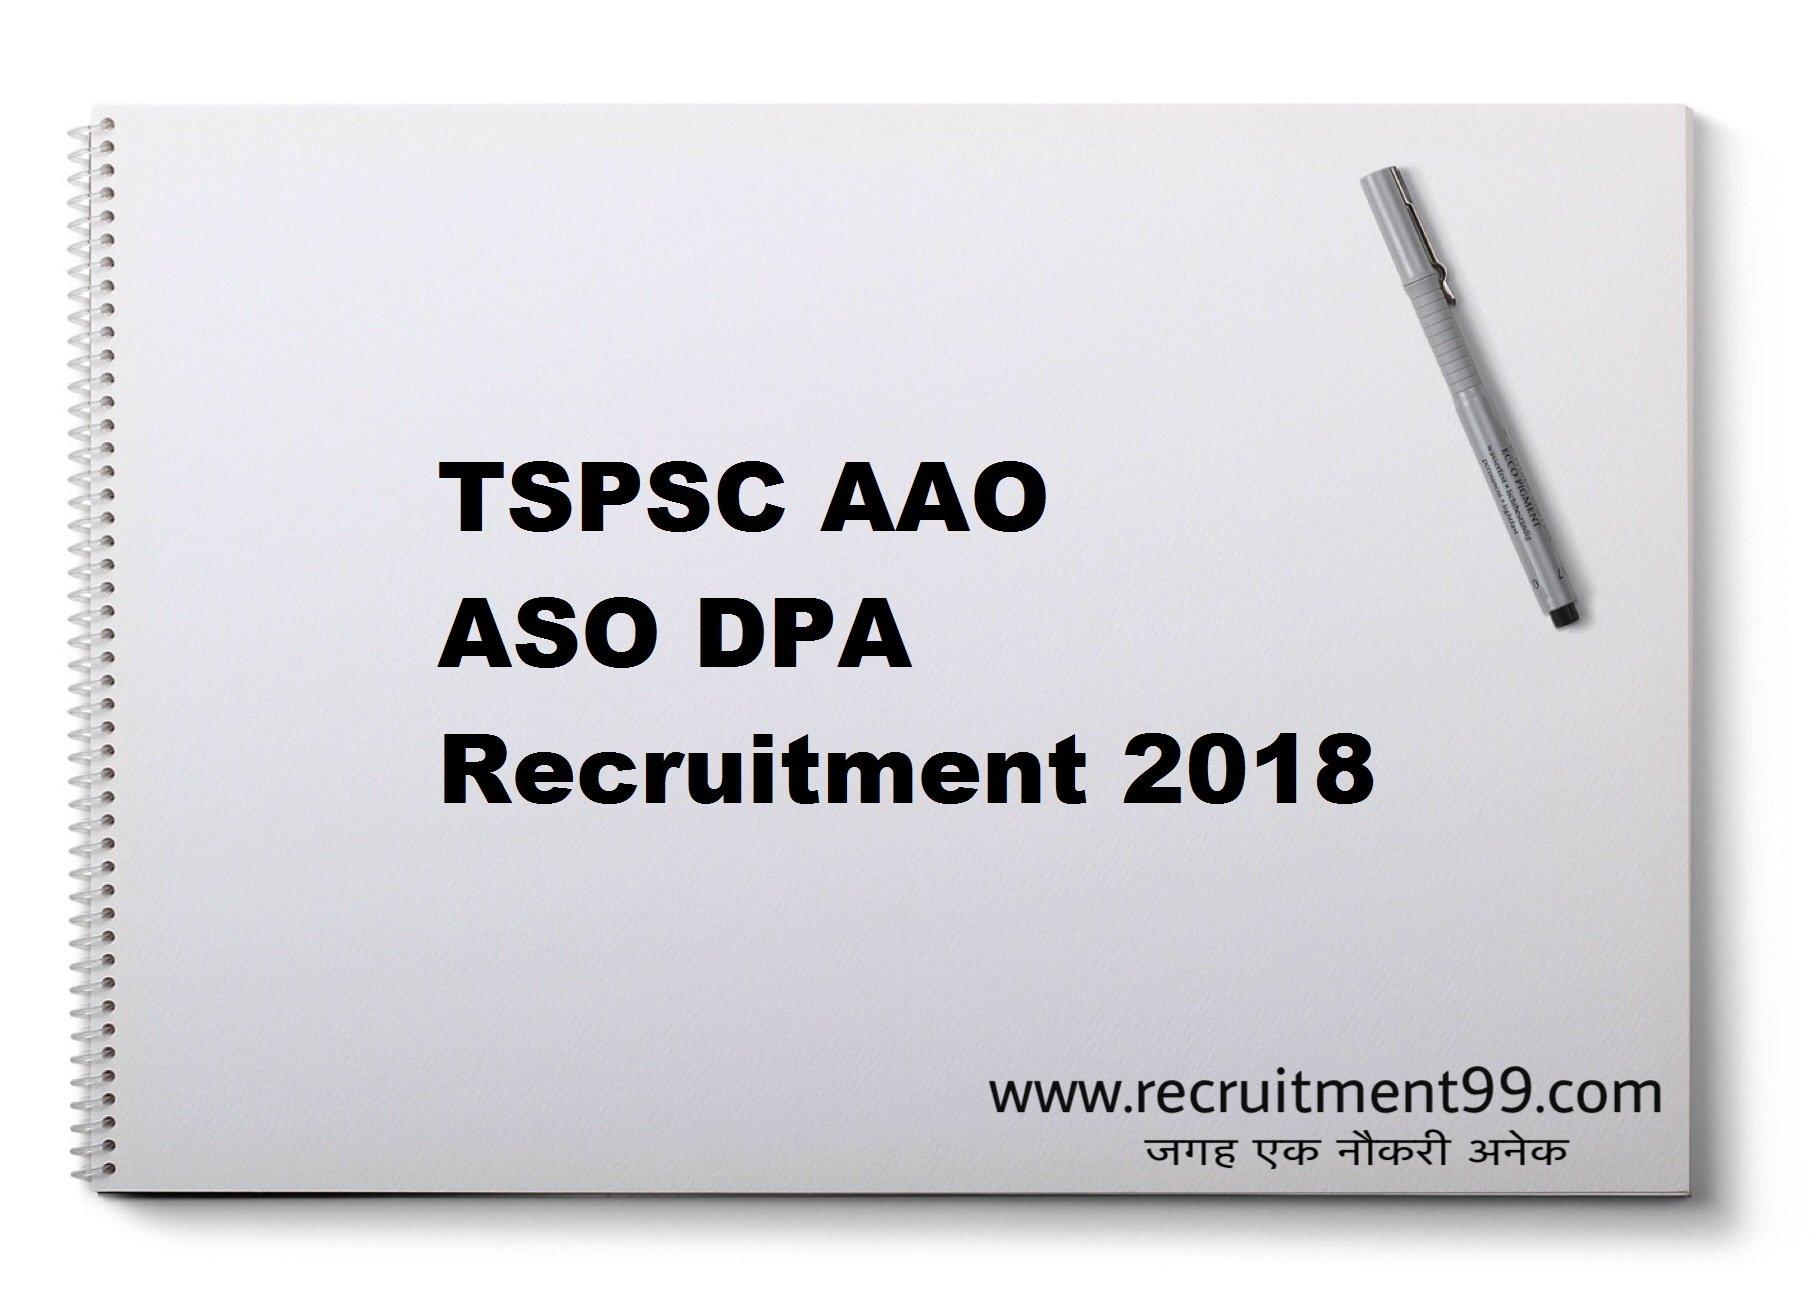 TSPSC AAO ASO DPA Recruitment Hall Ticket Result 2018